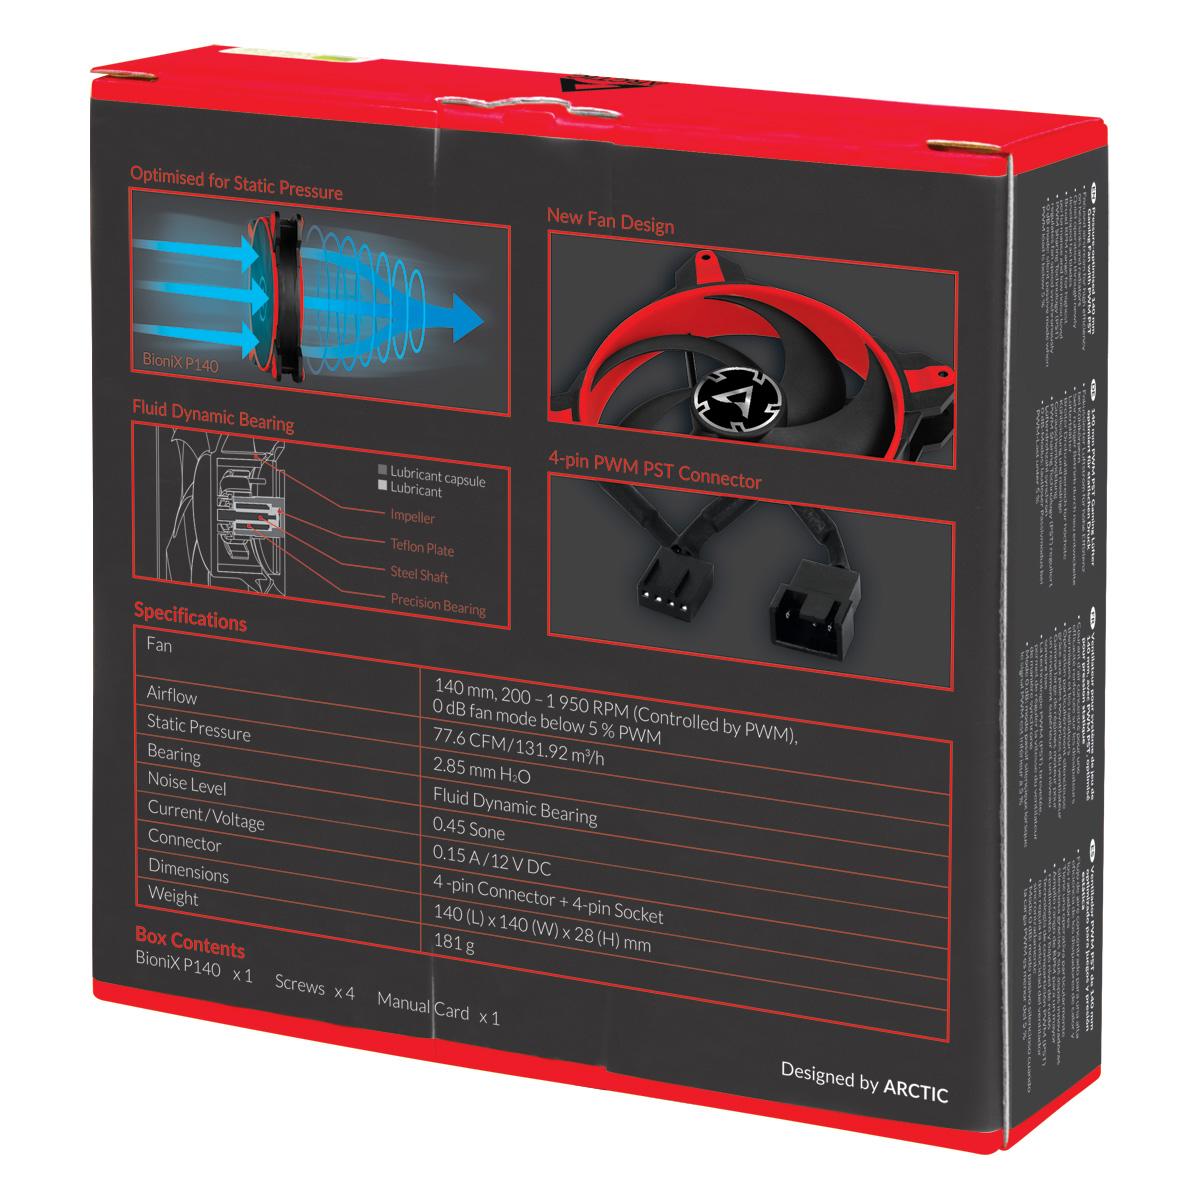 bionix p140 red 3